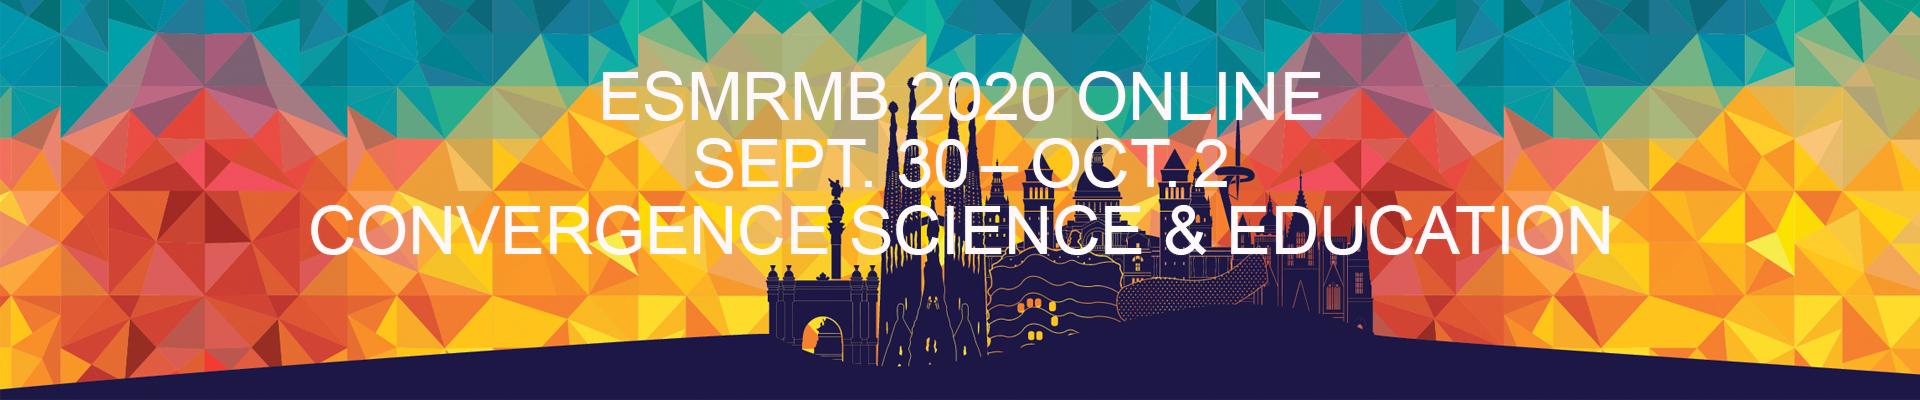 ESMRMB 2020 Online